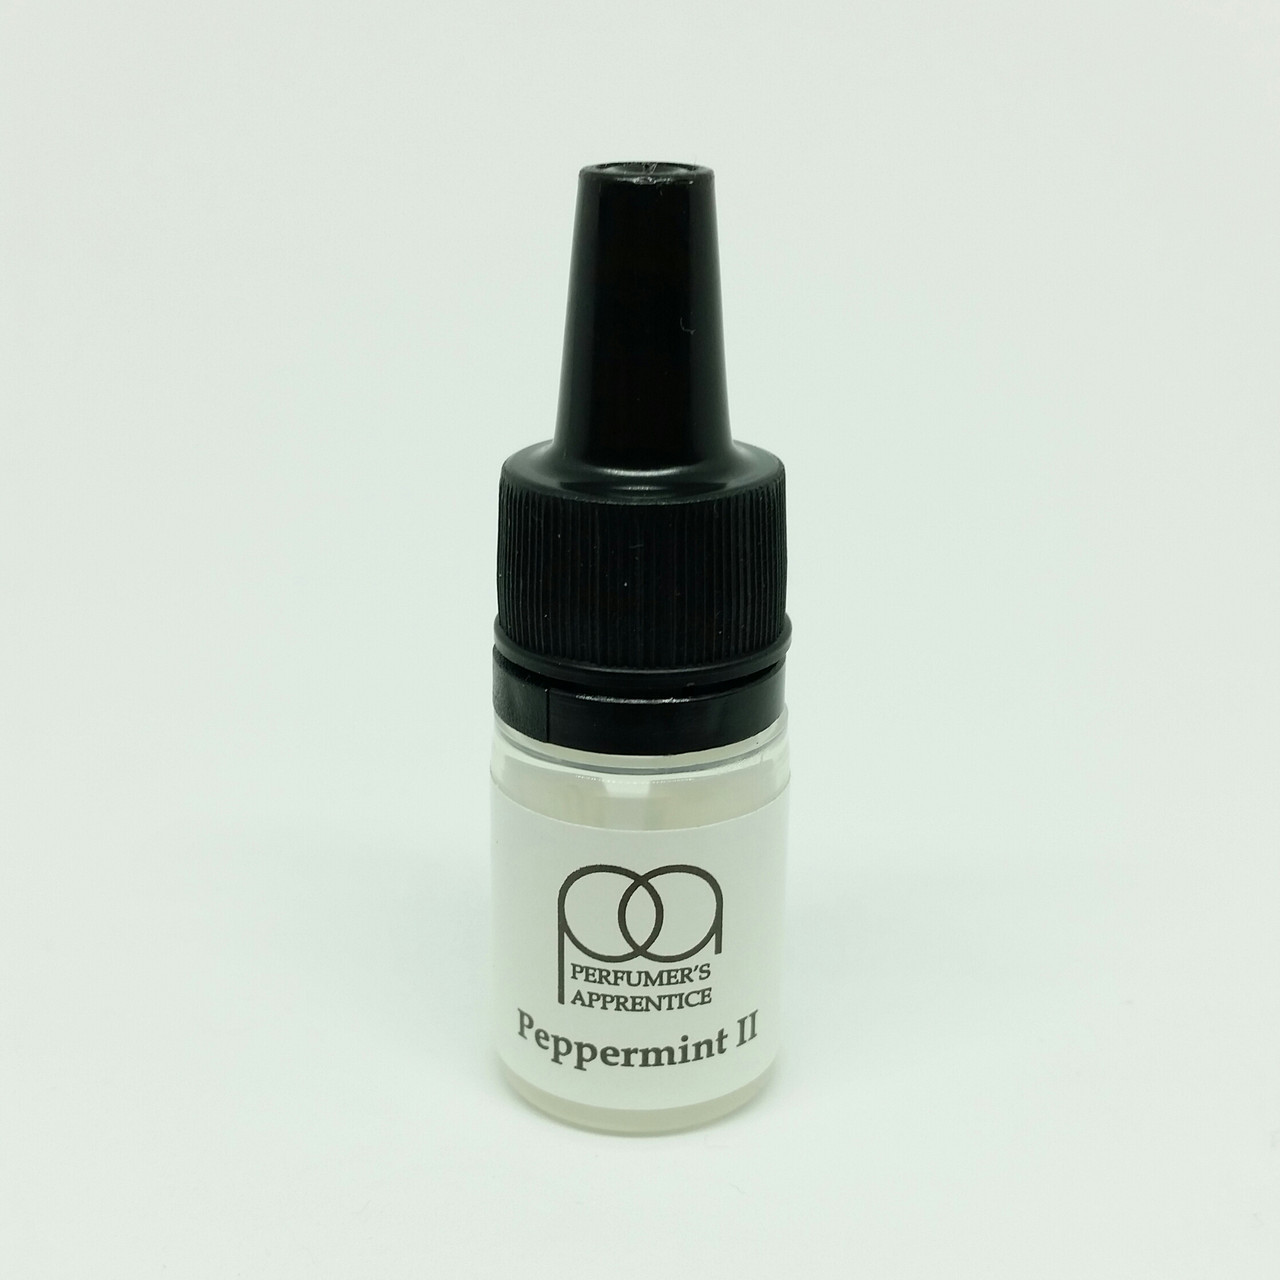 Ароматизатор TPA Peppermint II Flavor (Мятные Леденцы) 5 мл - №165